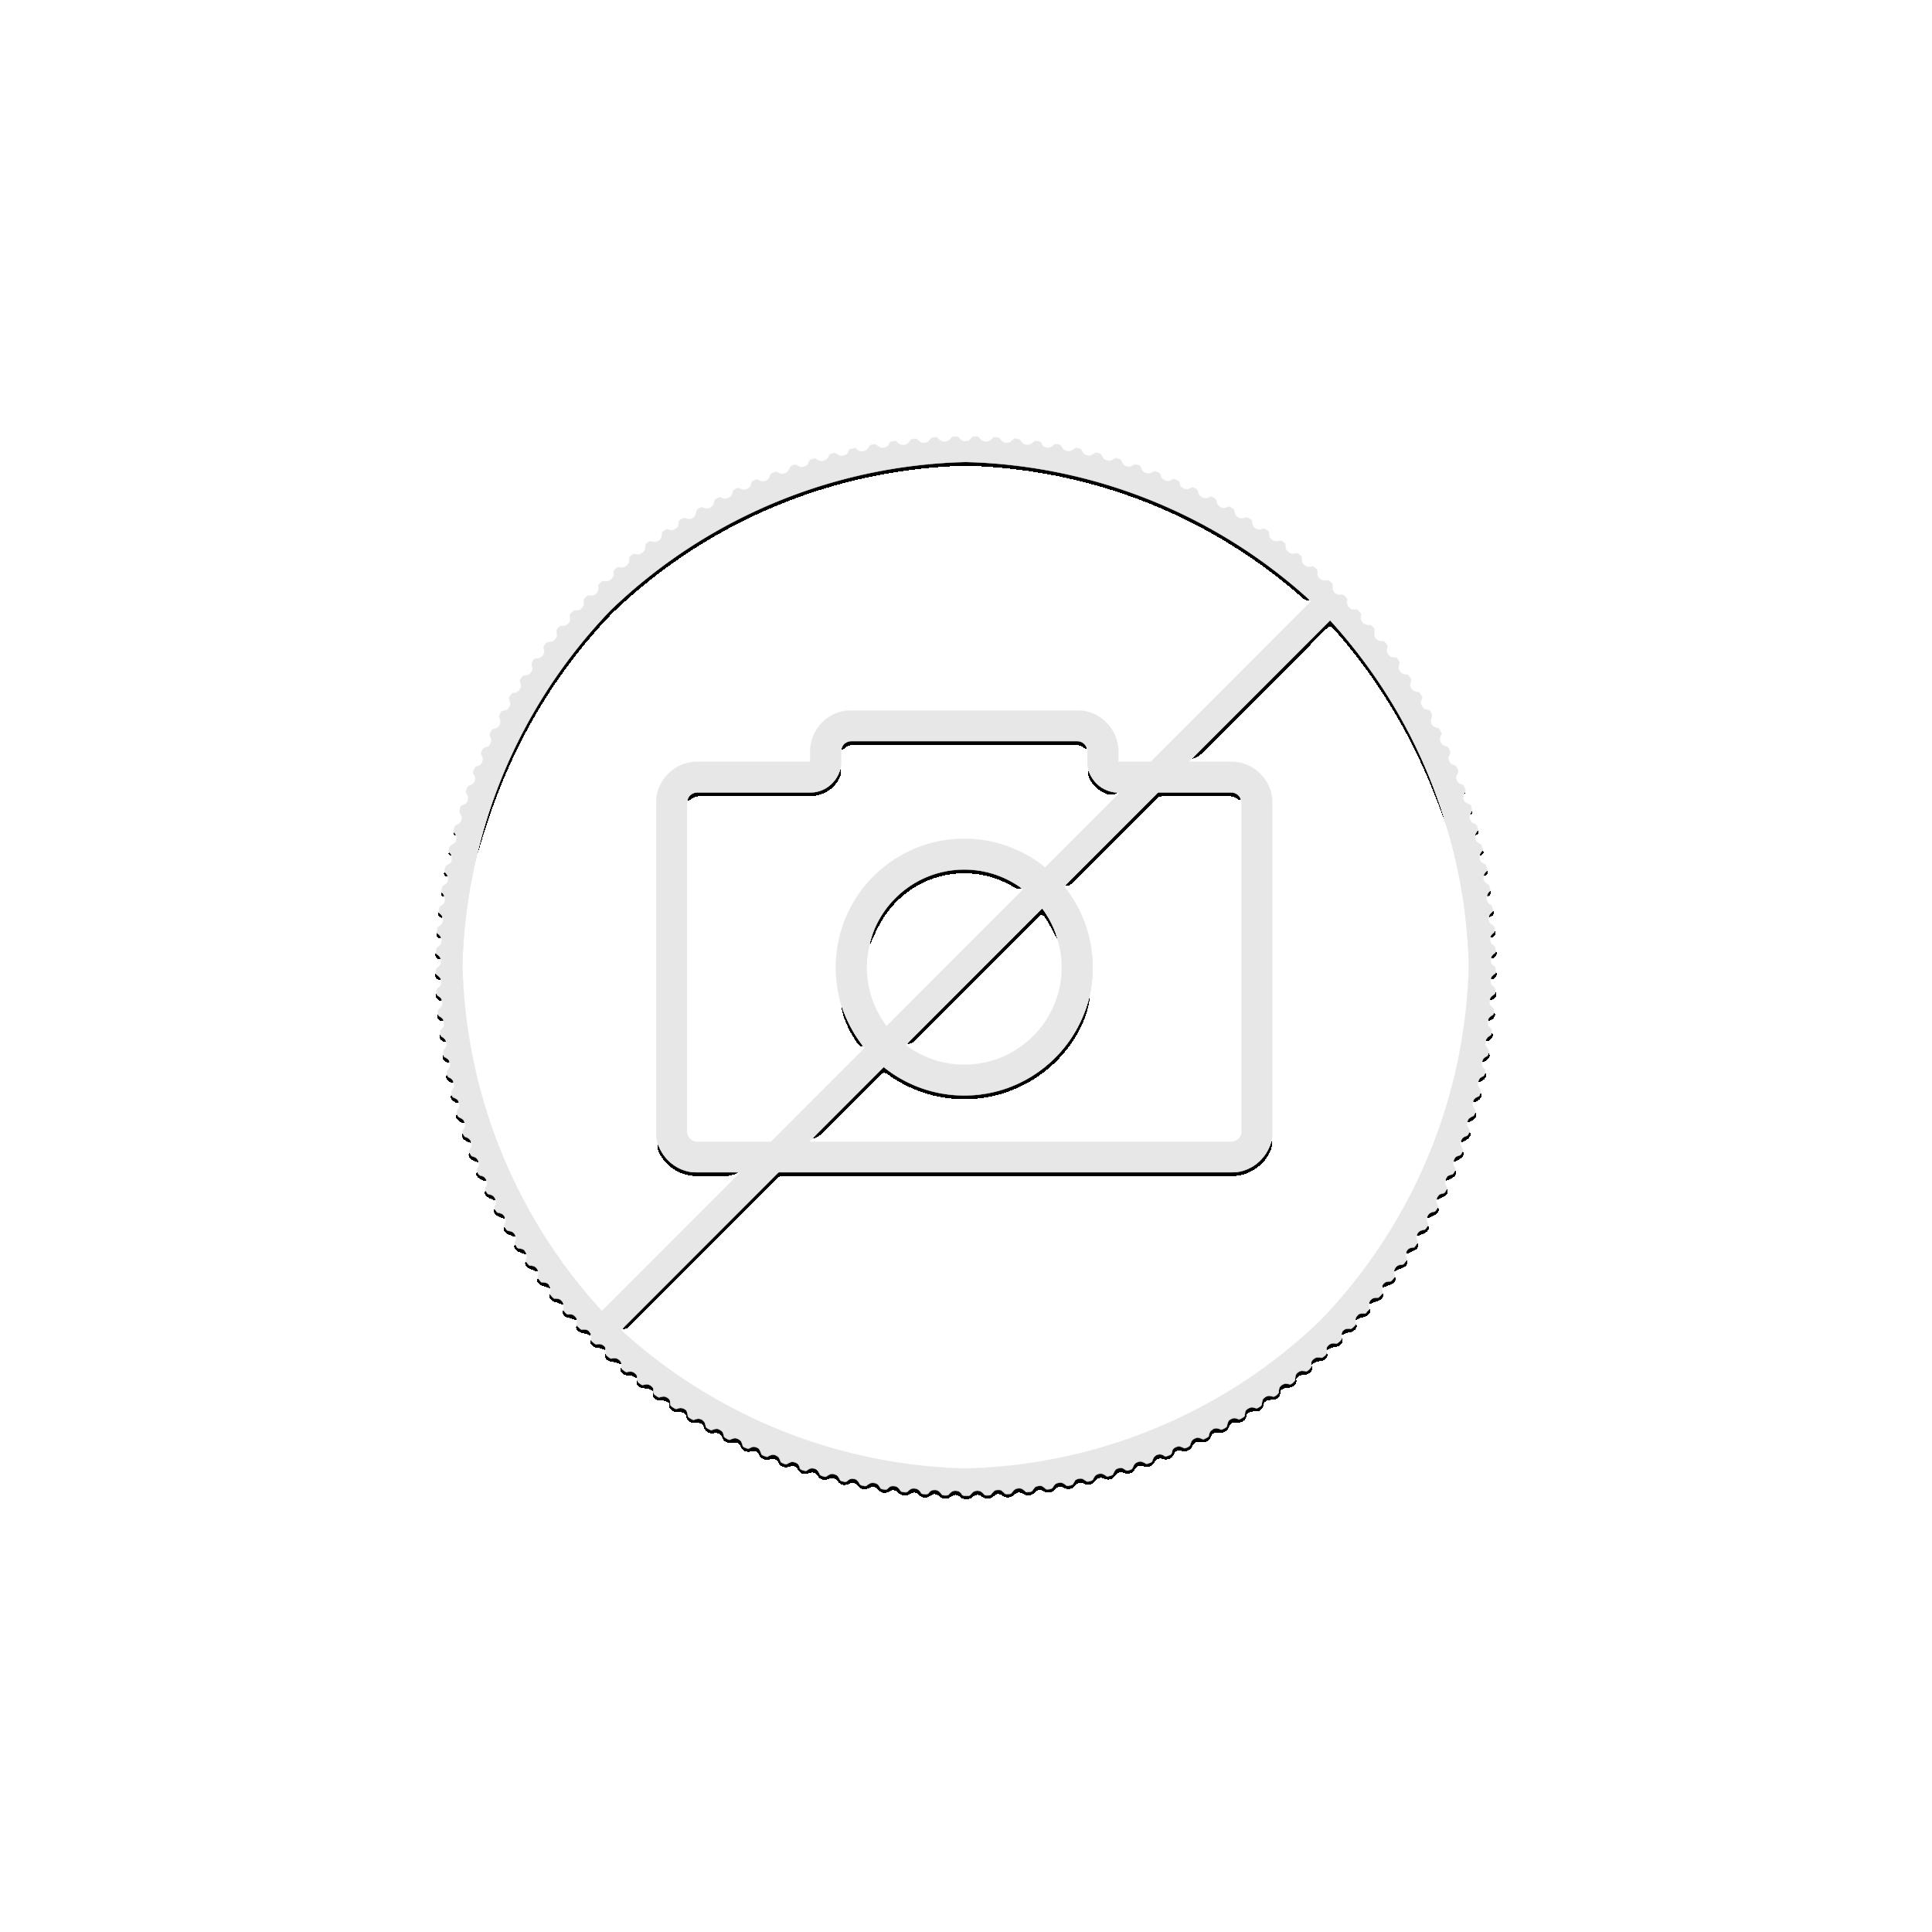 1 Troy ounce zilveren munt Pysanka Ei 2020 Proof - achterkant